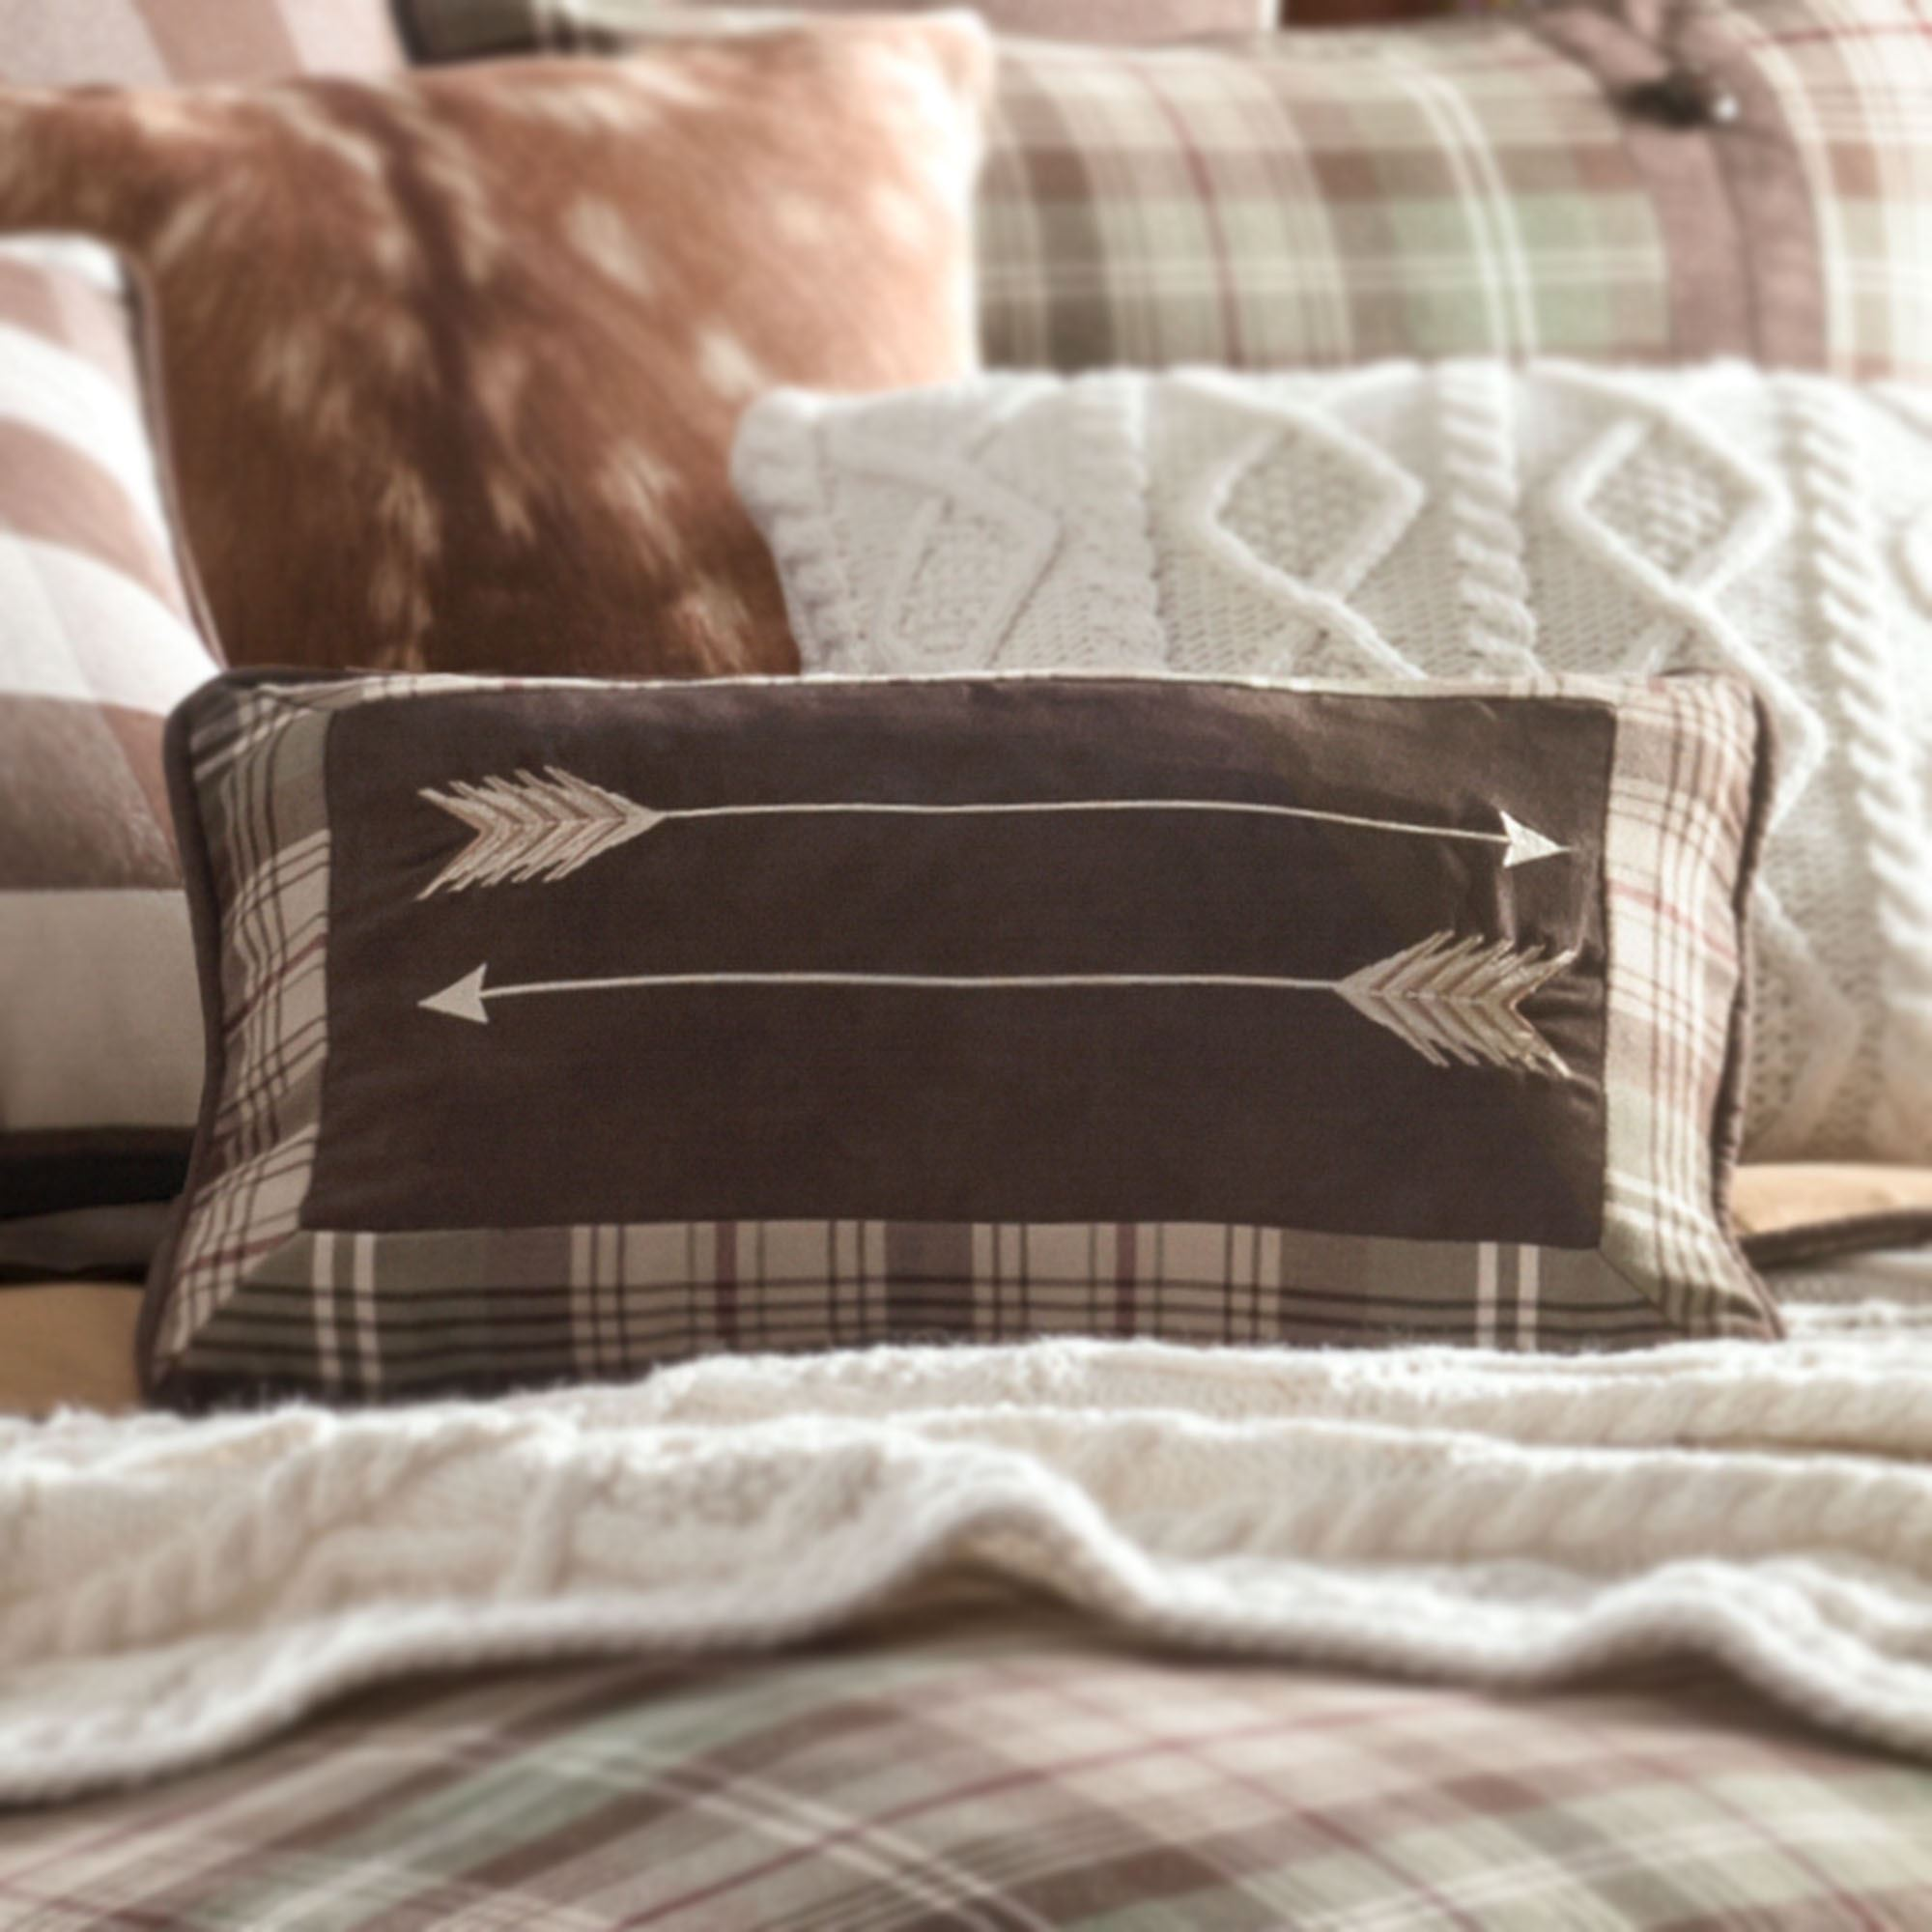 Huntsman Rustic Tartan Plaid Comforter Bedding By Mossy Oak